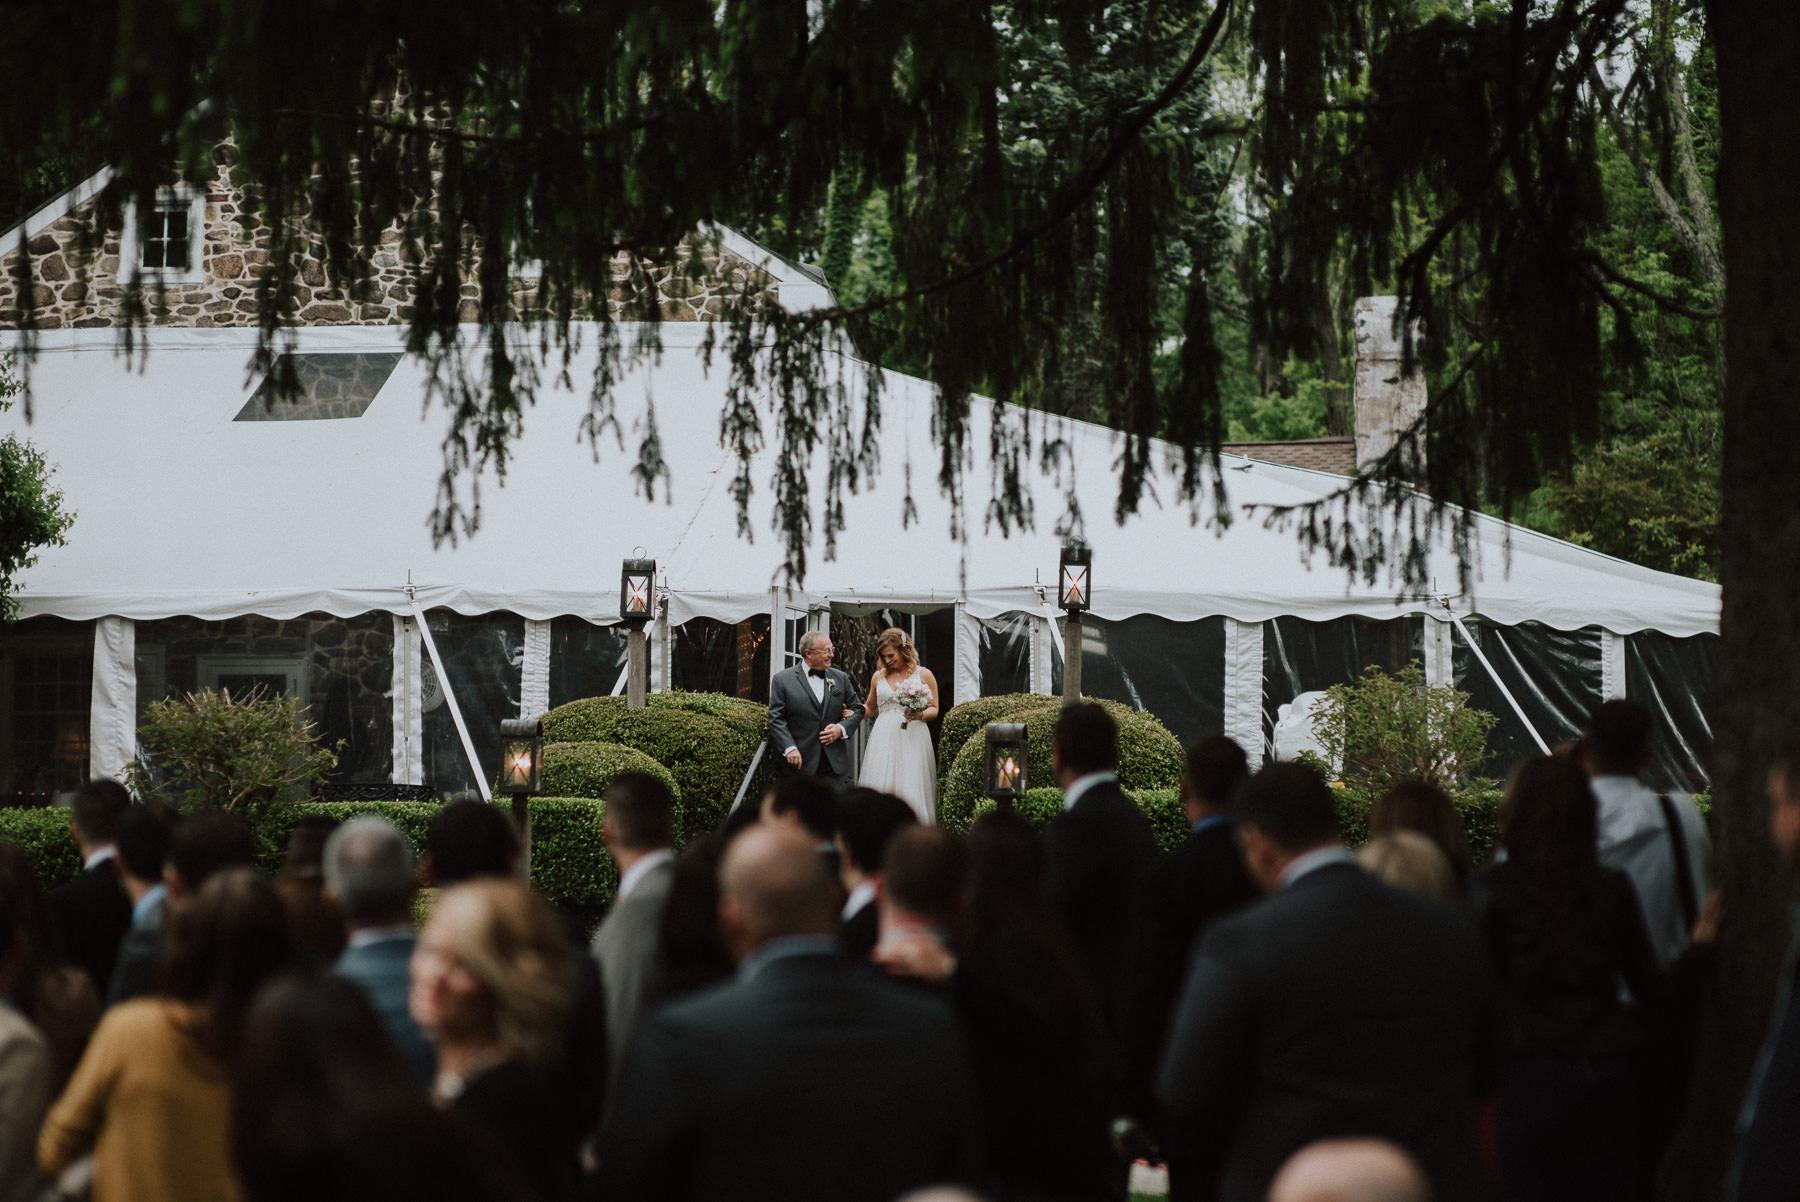 appleford-estate-wedding-photography-54.jpg